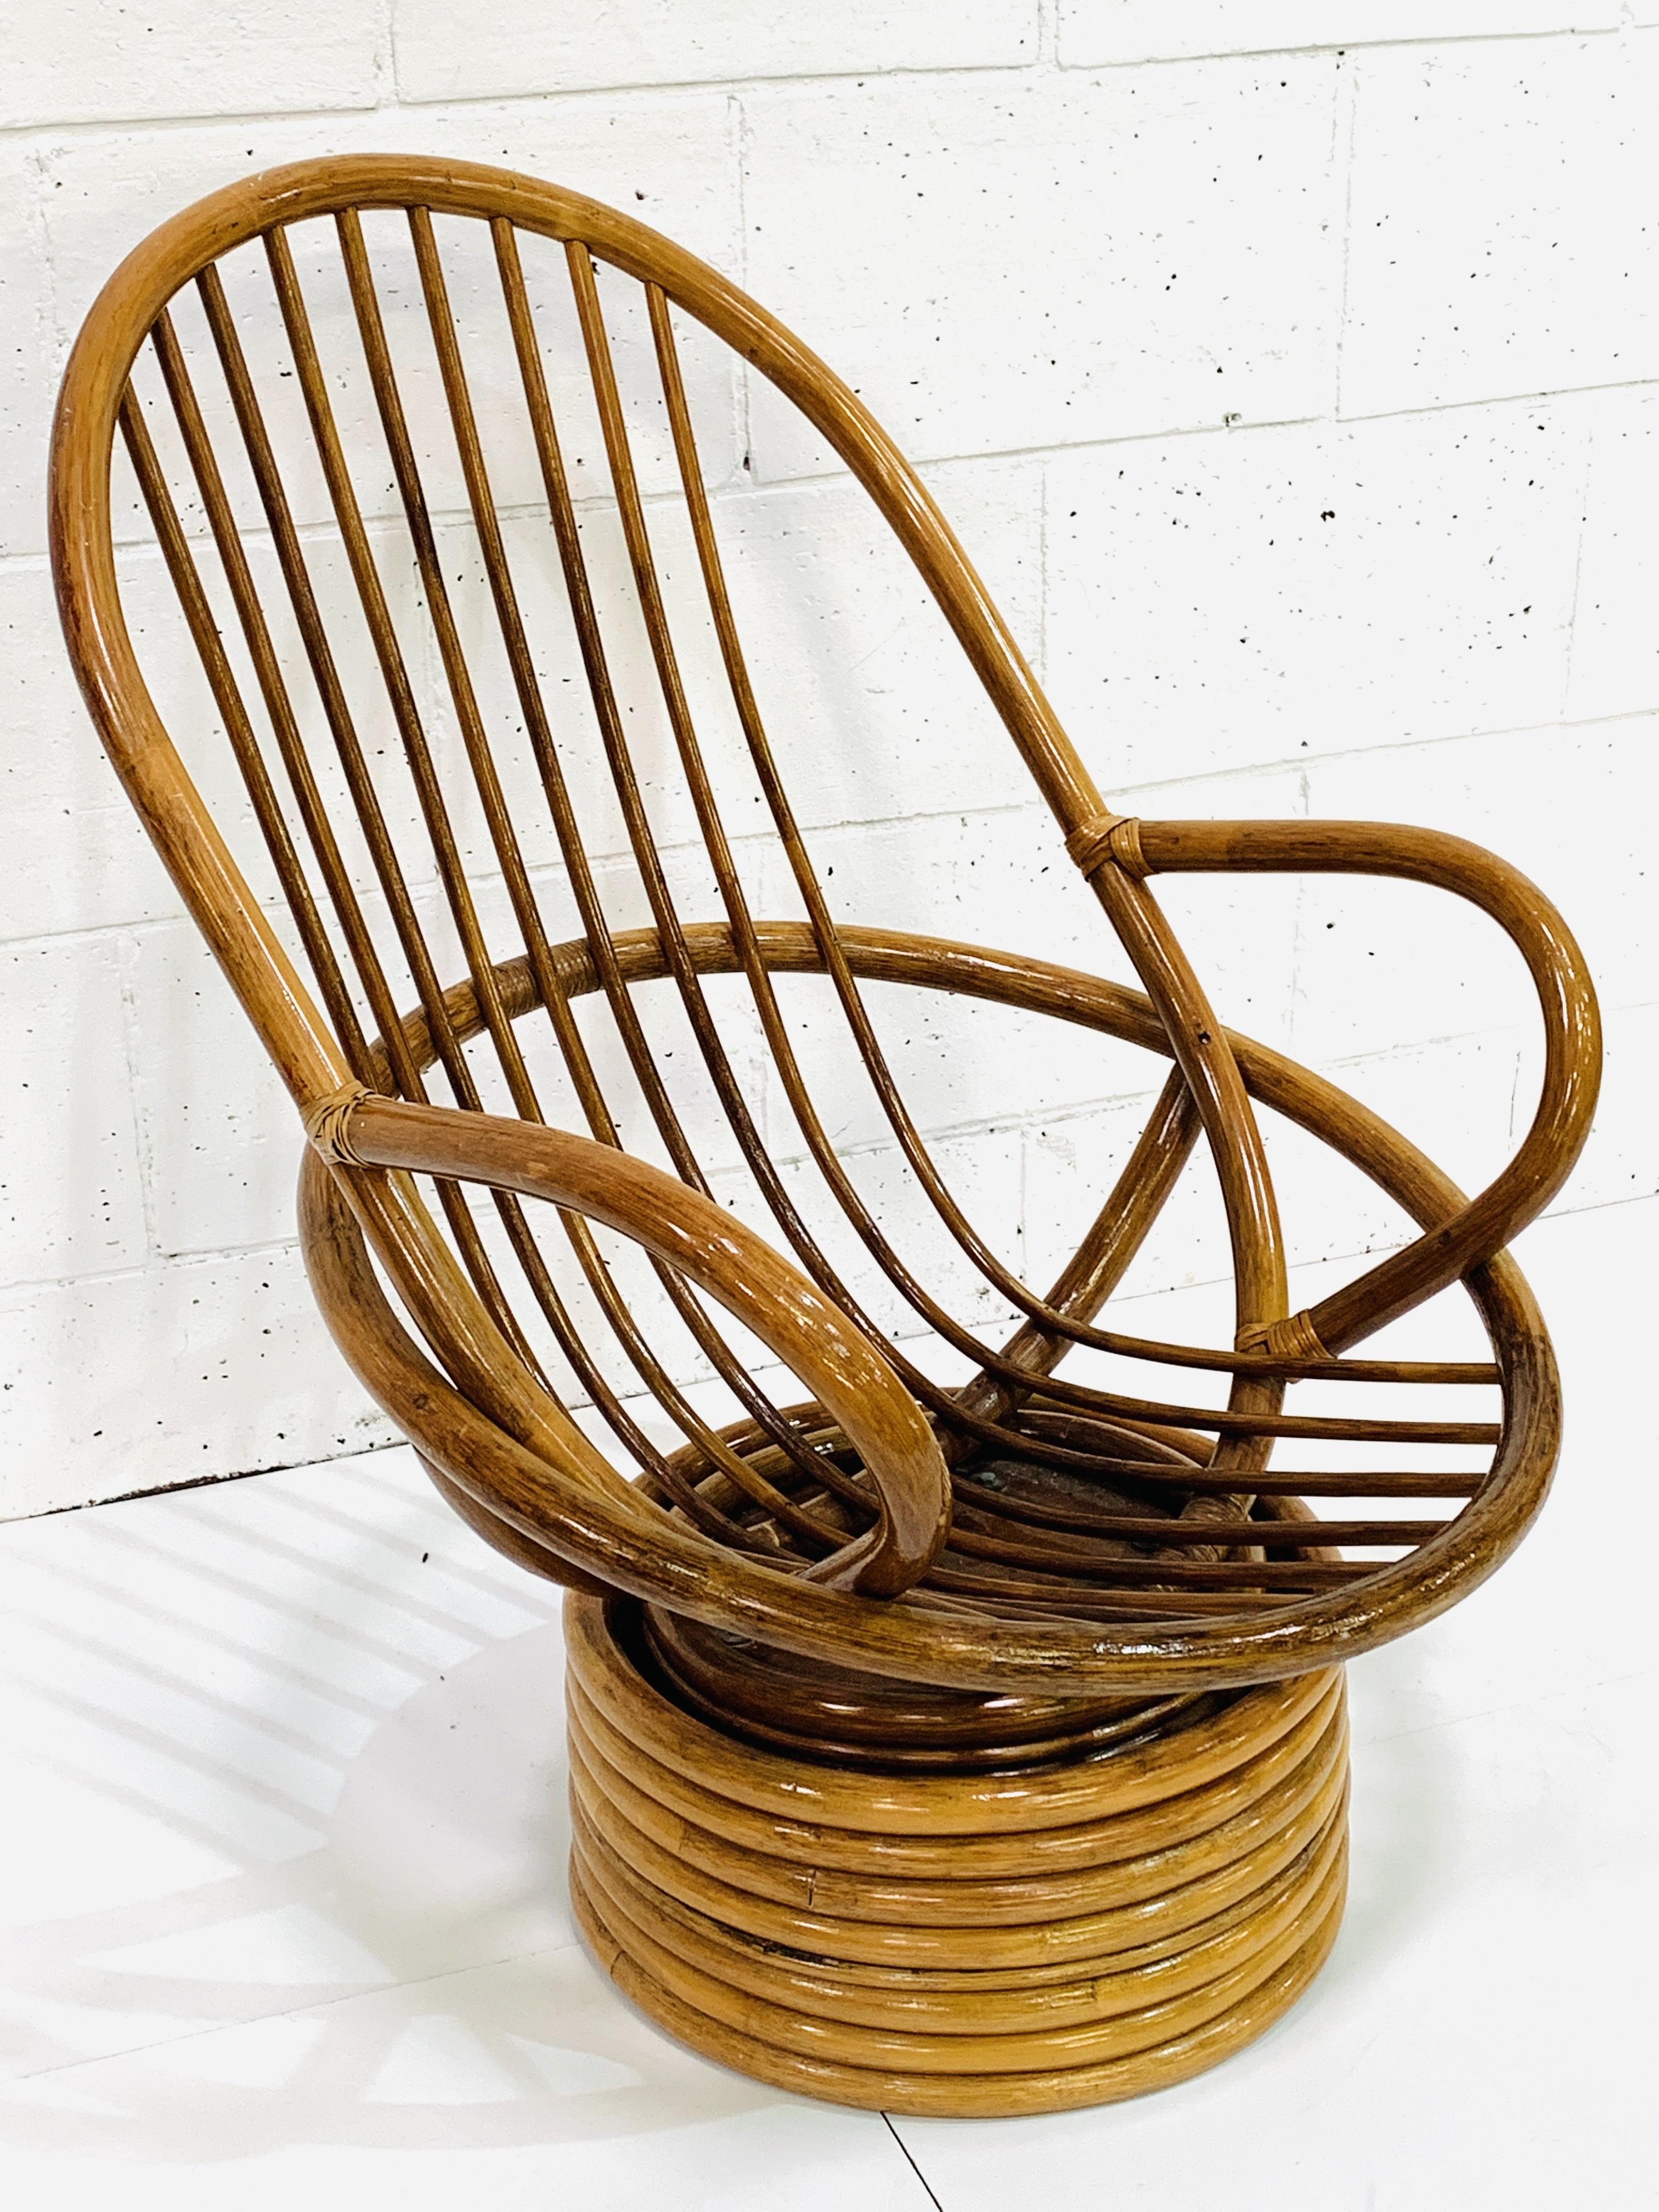 Cane swivel tub armchair - Image 2 of 3